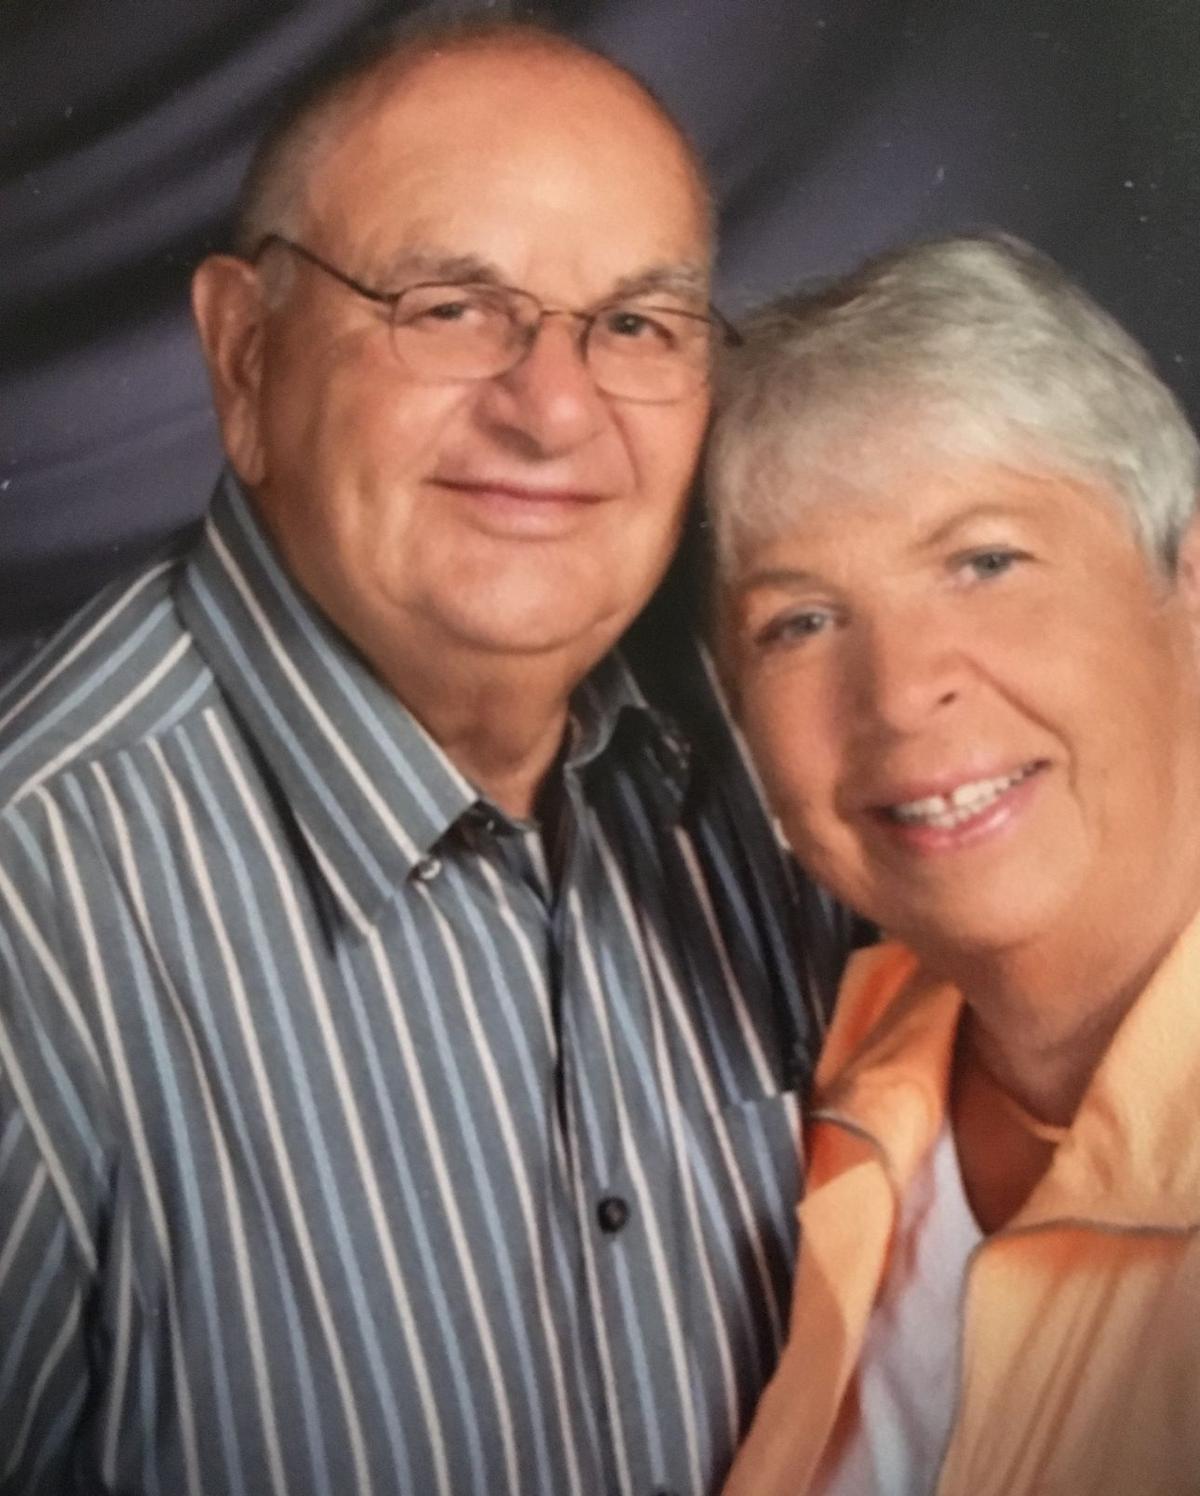 Mr. and Mrs. James Drascic